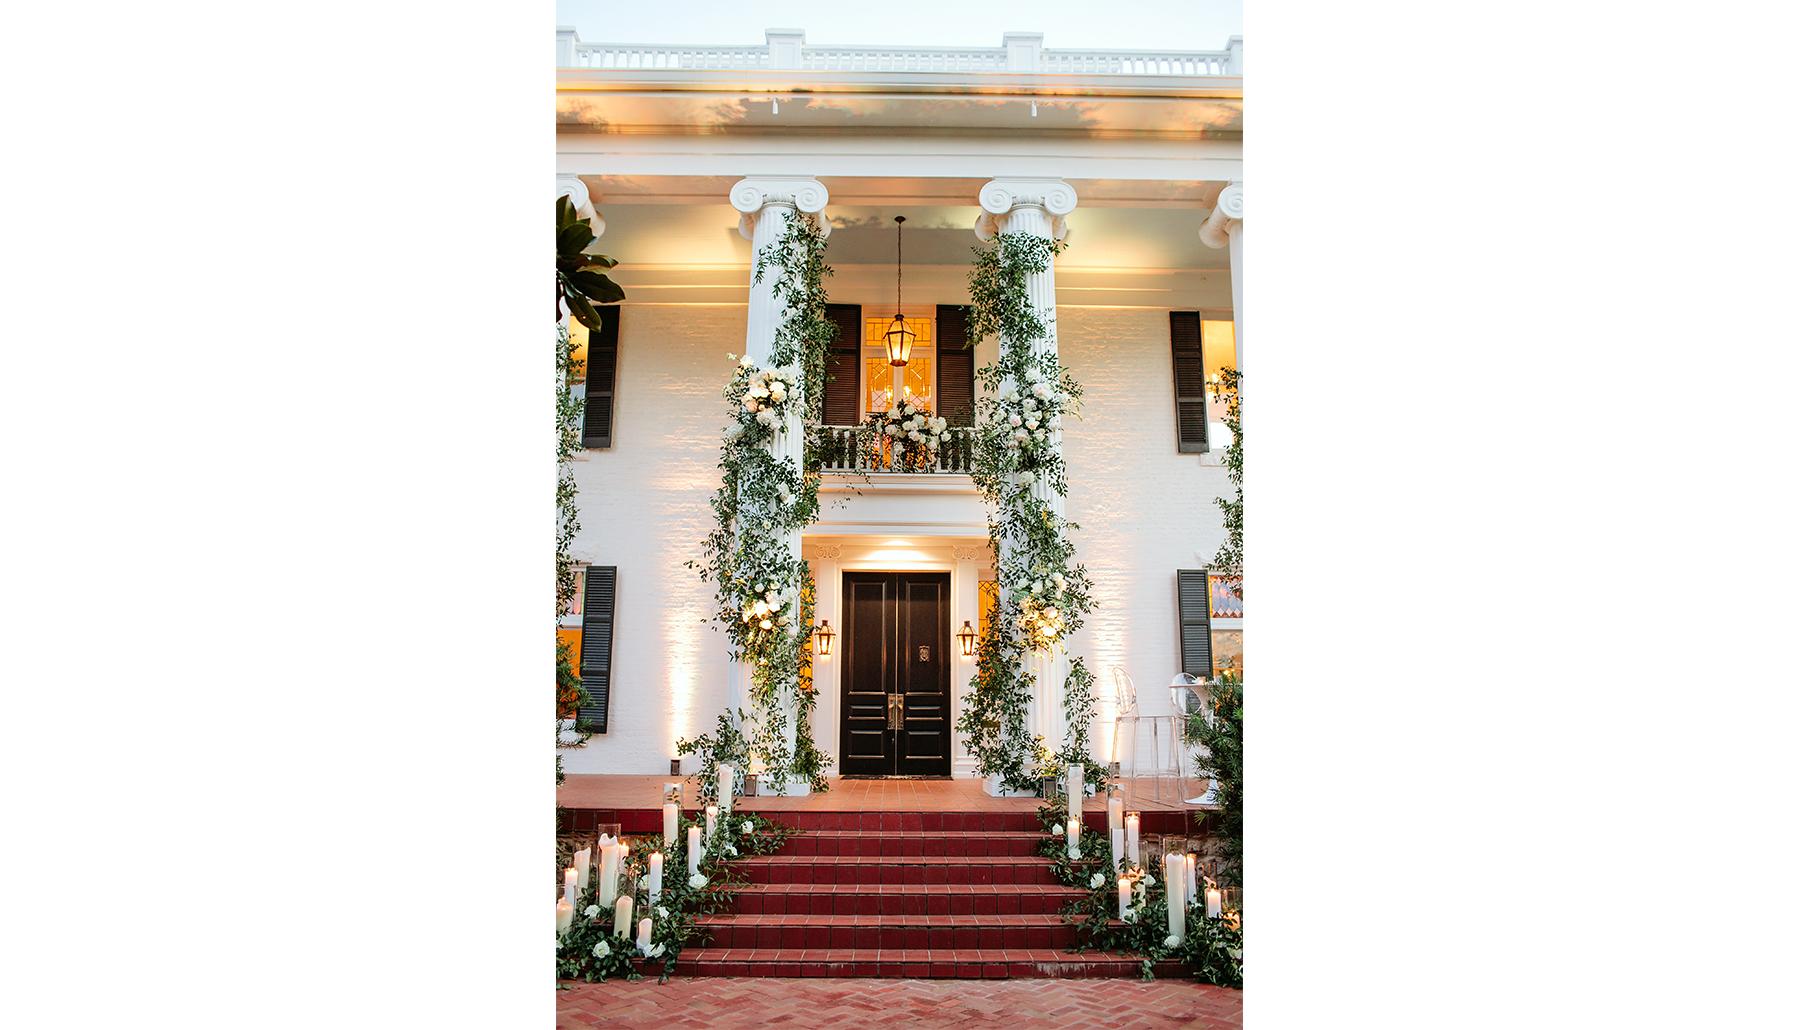 Woodbine Mansion Entrance Twilight